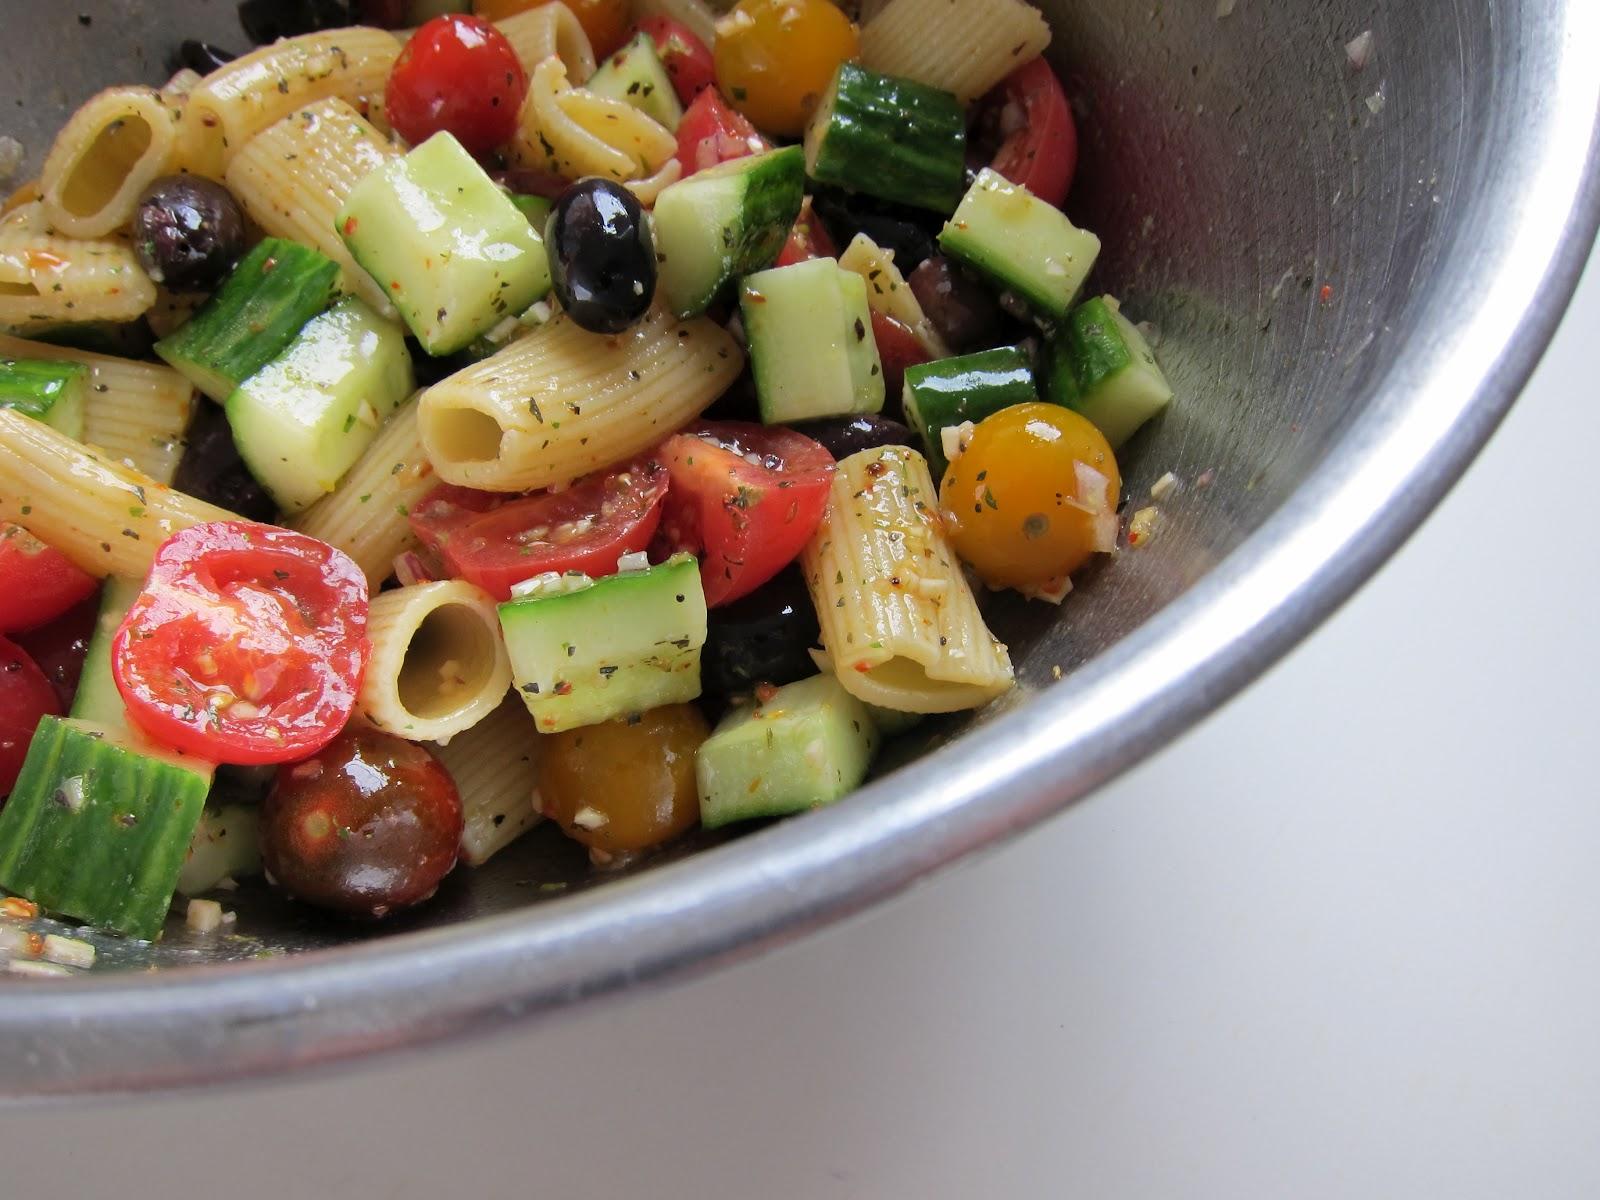 Vegetarian Detective: The Case of Tomato Cucumber Pasta Salad